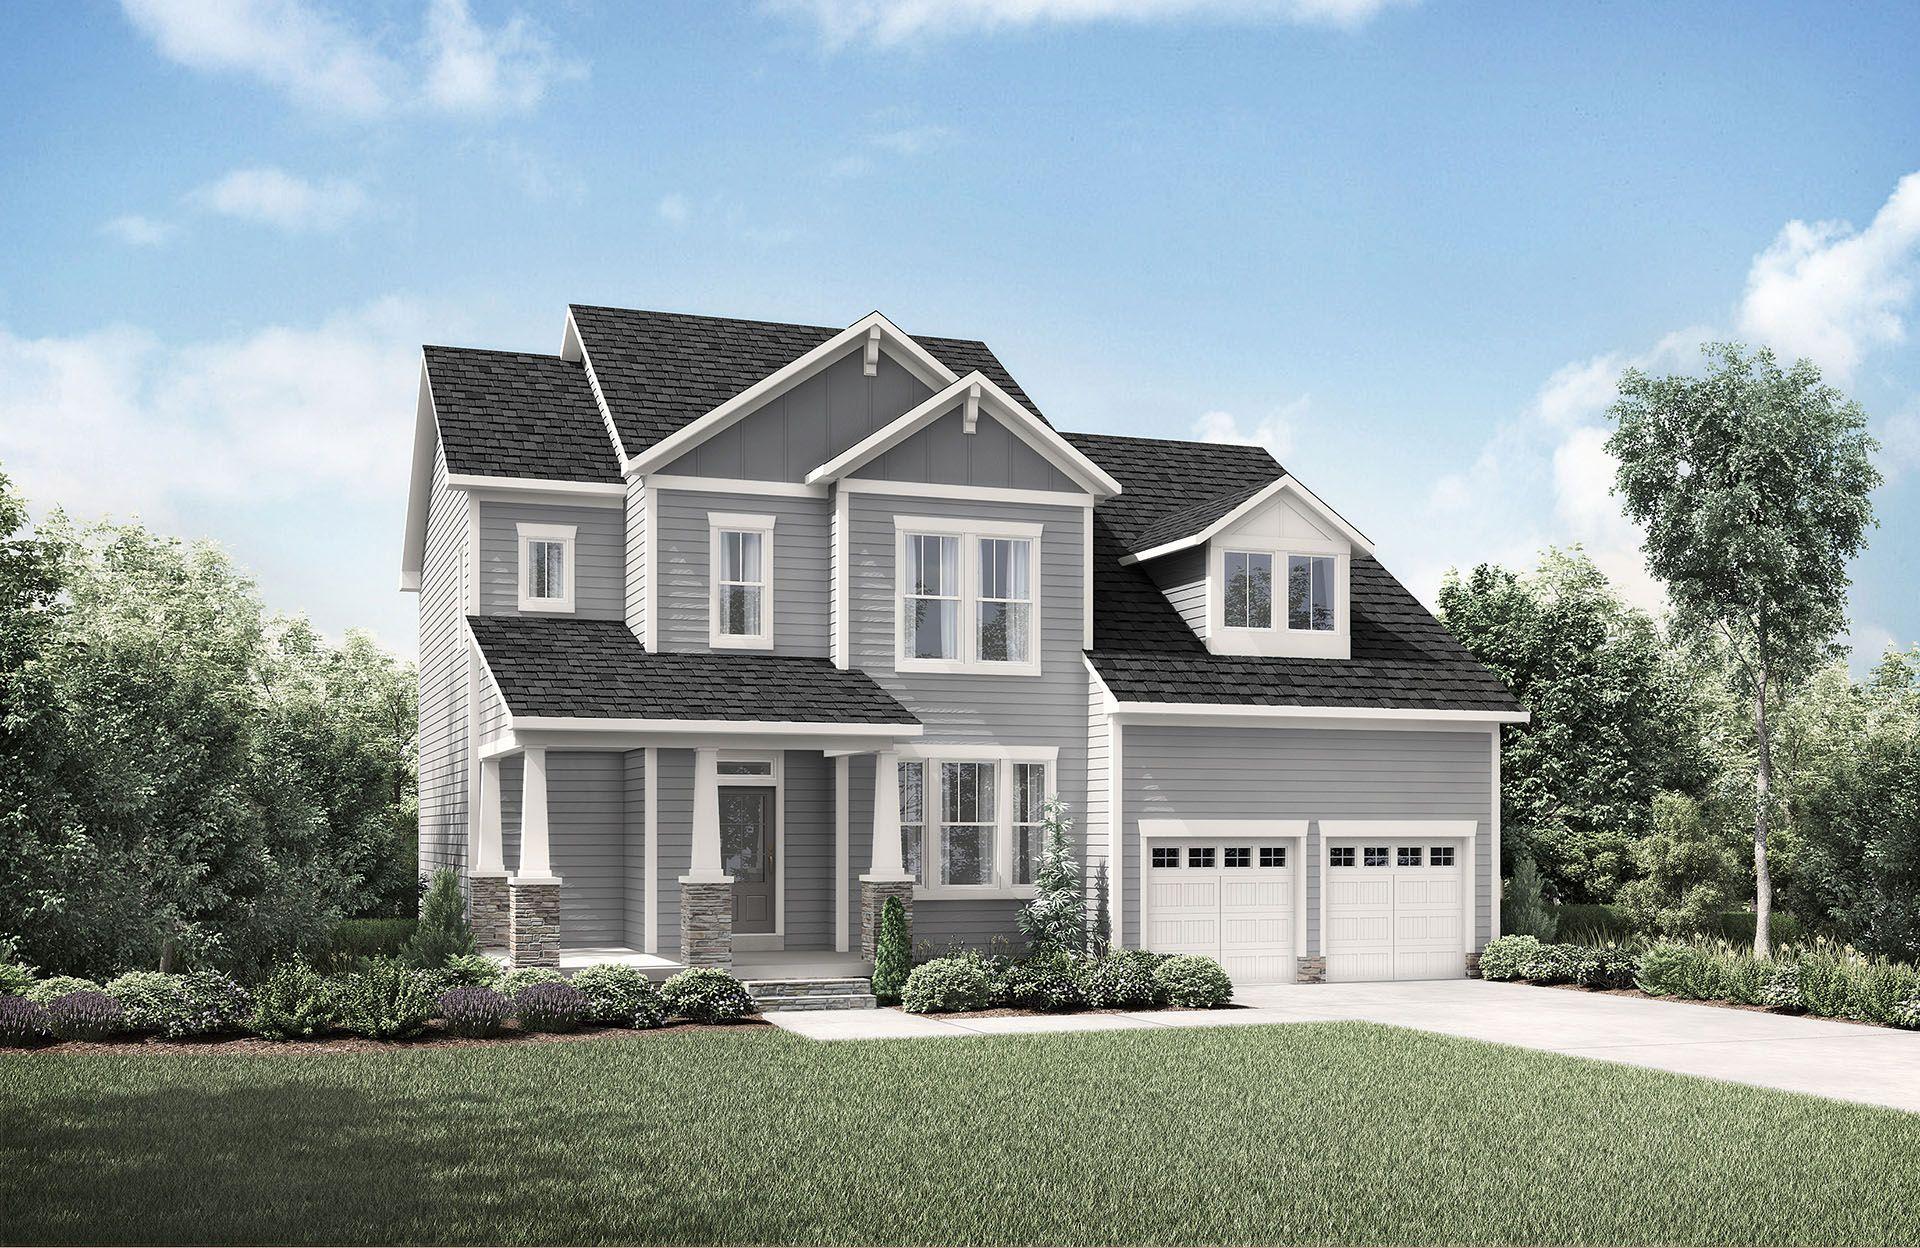 Single Family for Sale at Corbin Creek Woods - Hayes 814 Morelanda Drive Hillsborough, North Carolina 27278 United States